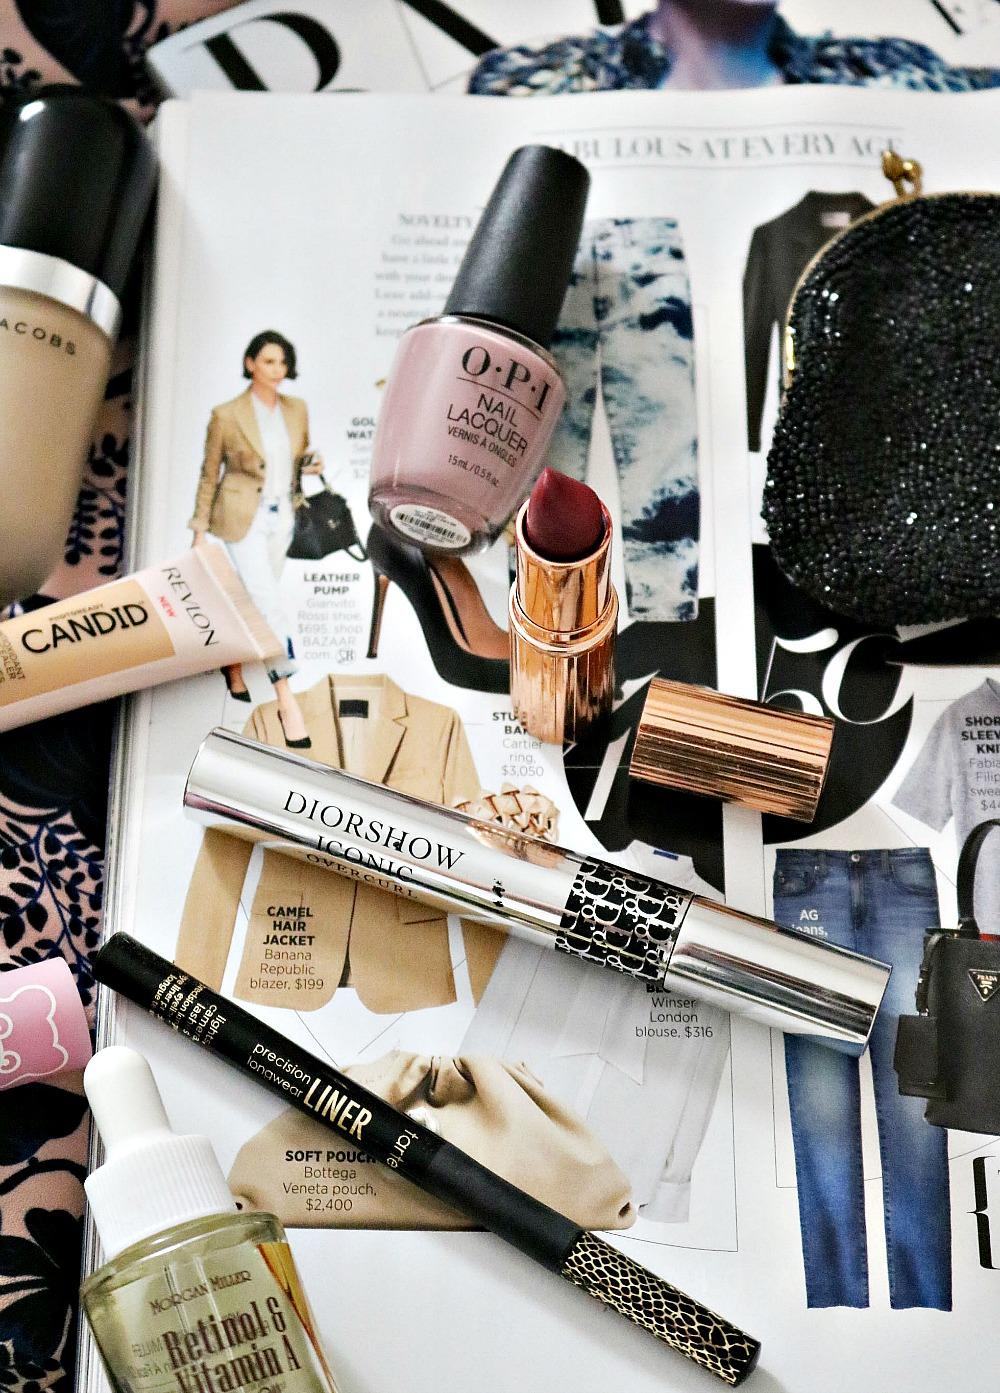 Early Fall Beauty Favorites I Dior Mascara, Charlotte Tilbury Lipstick, Tarte Eyeliner #fallmakeup #makeup #beautyblog